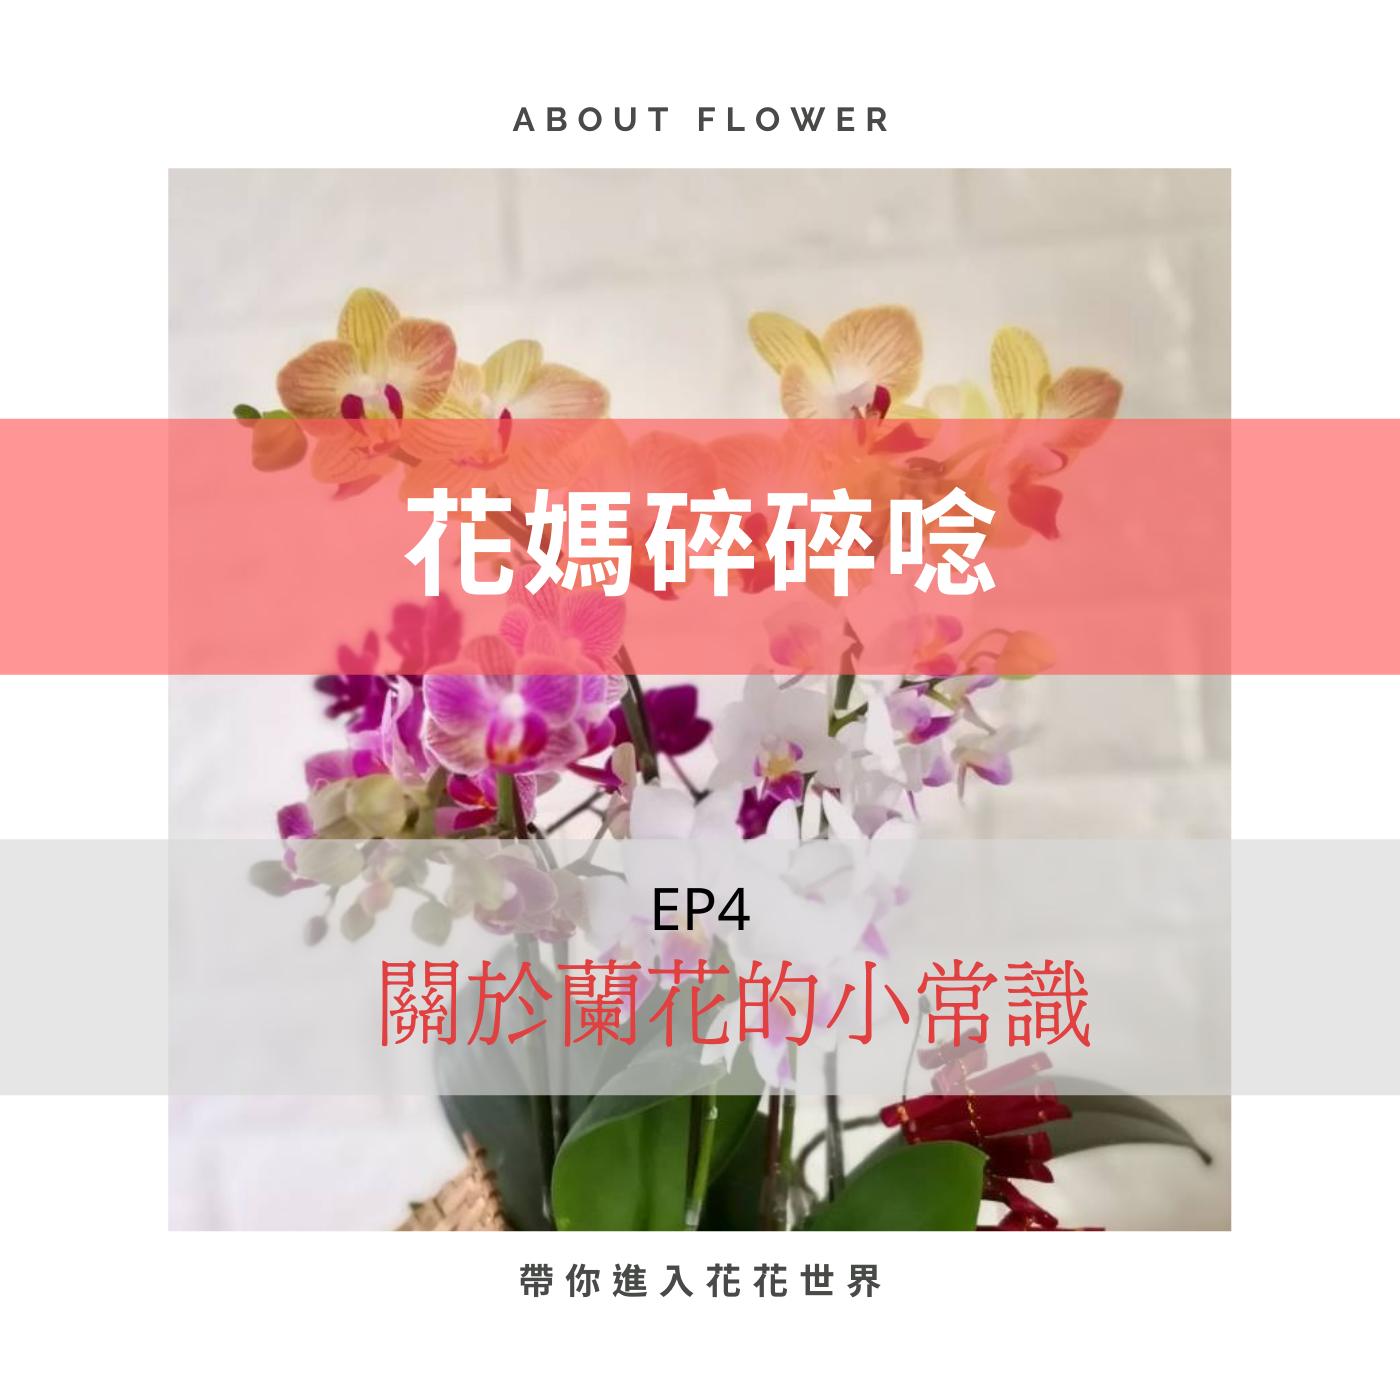 EP4 關於蘭花的小常識